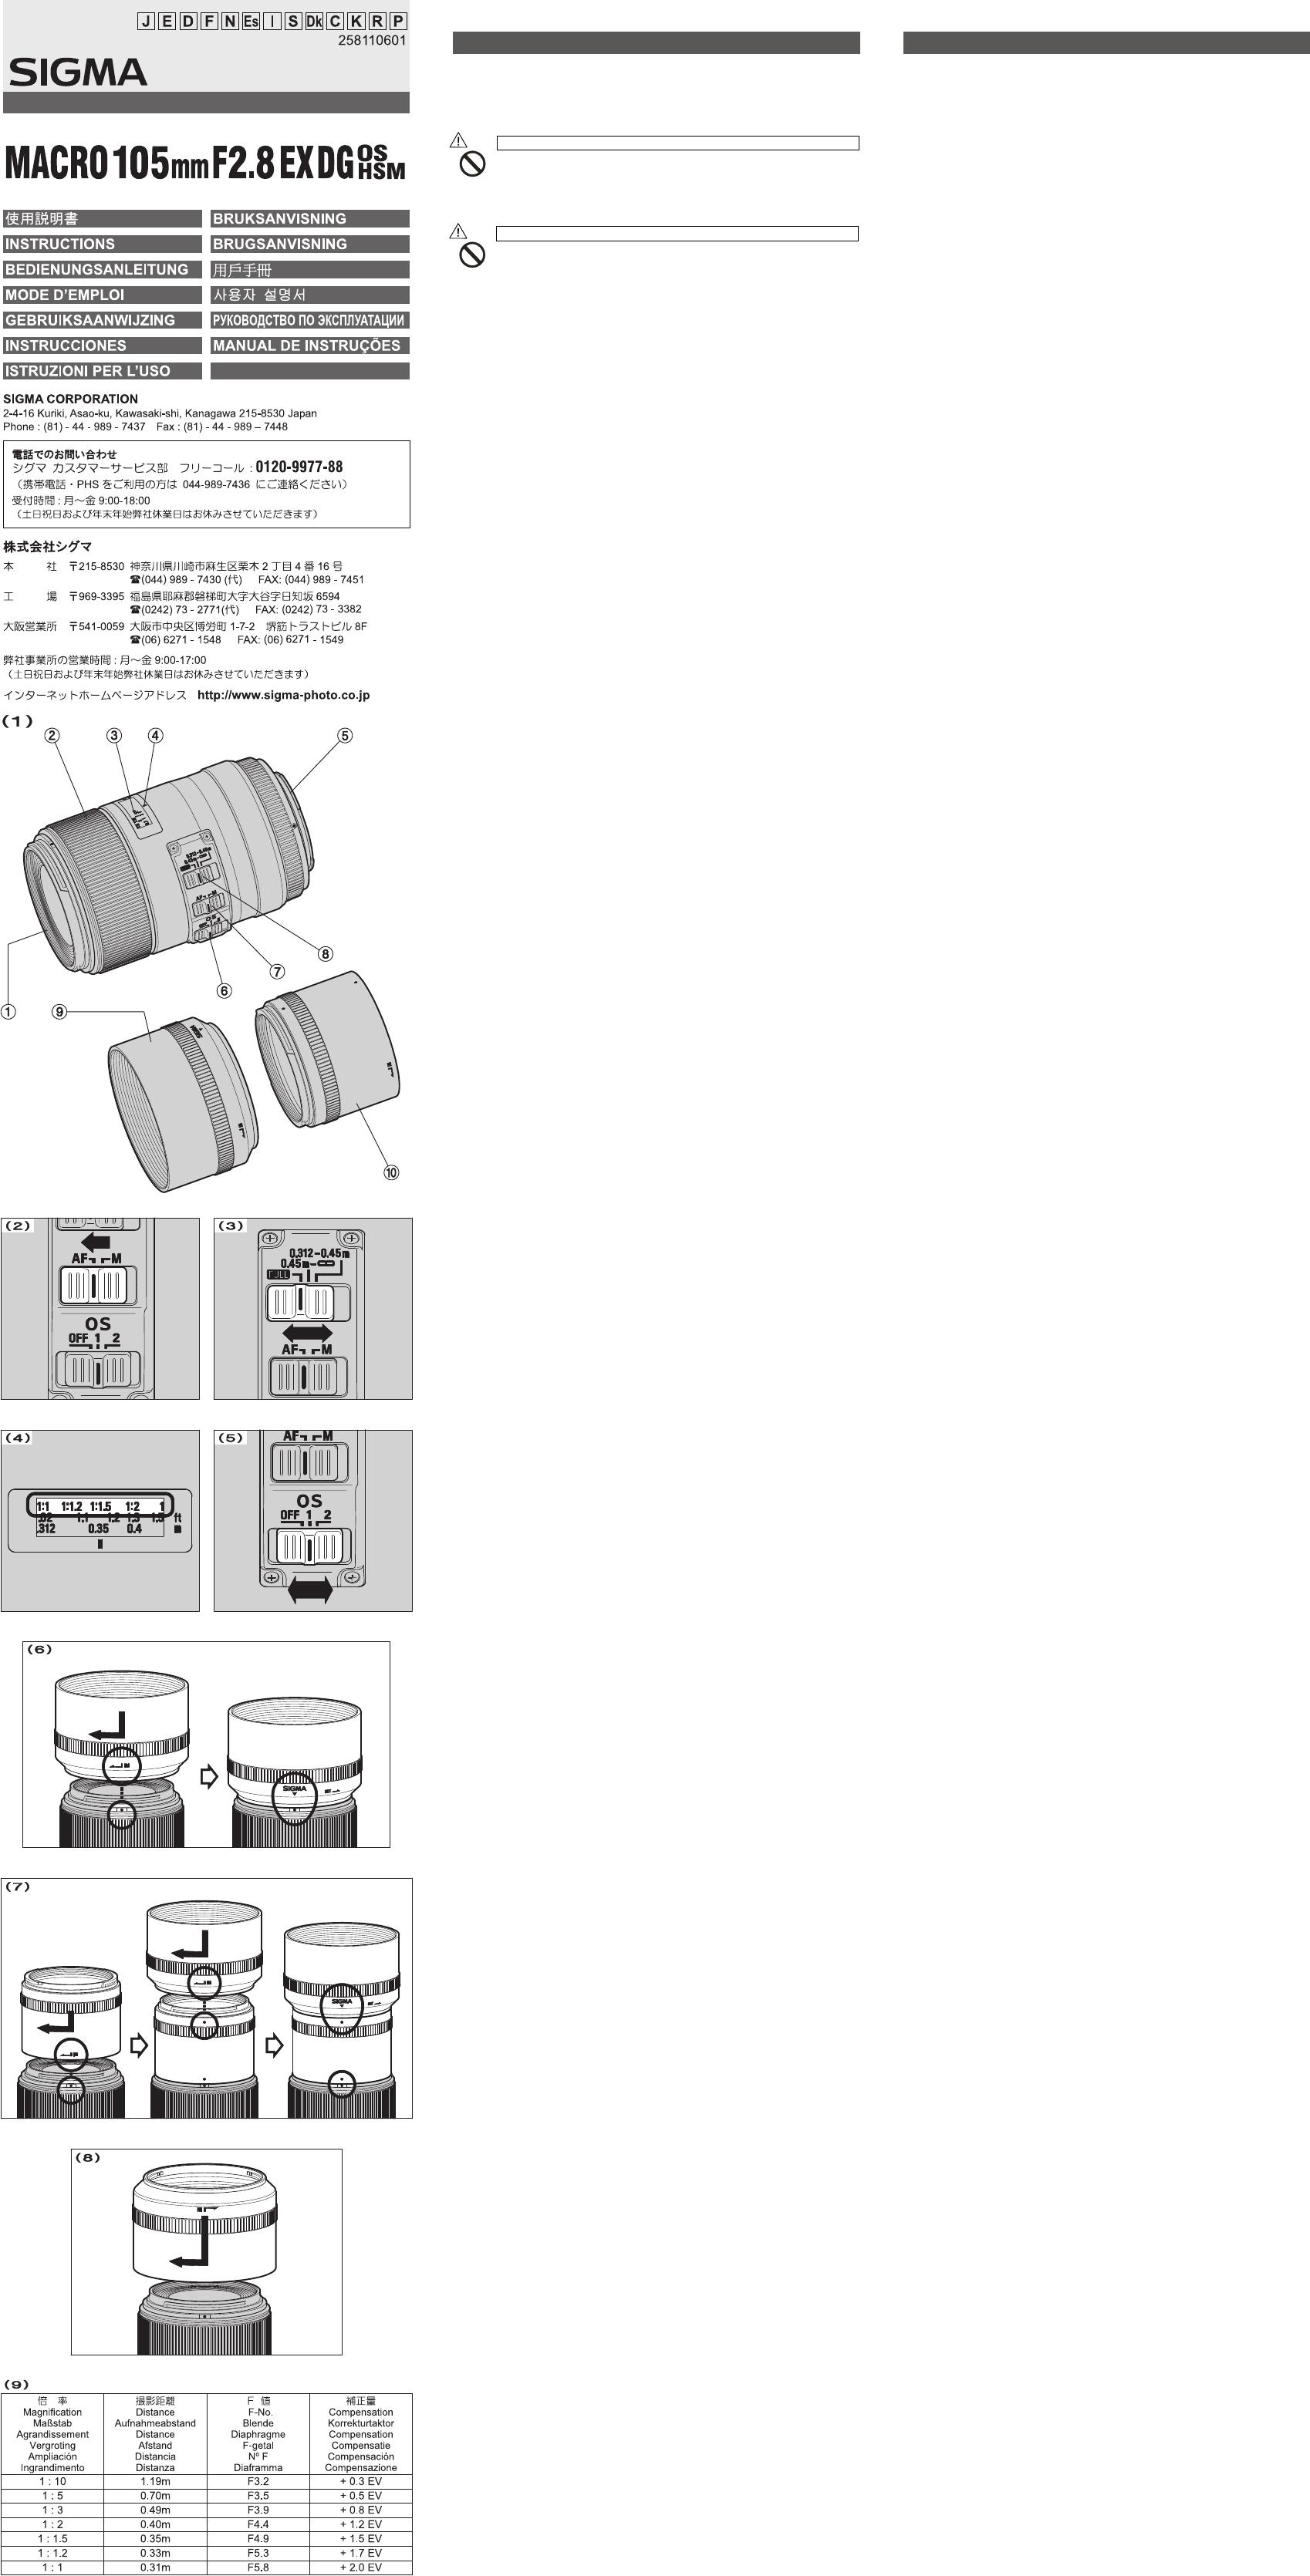 Handleiding Sigma 105mm F28 Ex Dg Os Hsm Pagina 1 Van 2